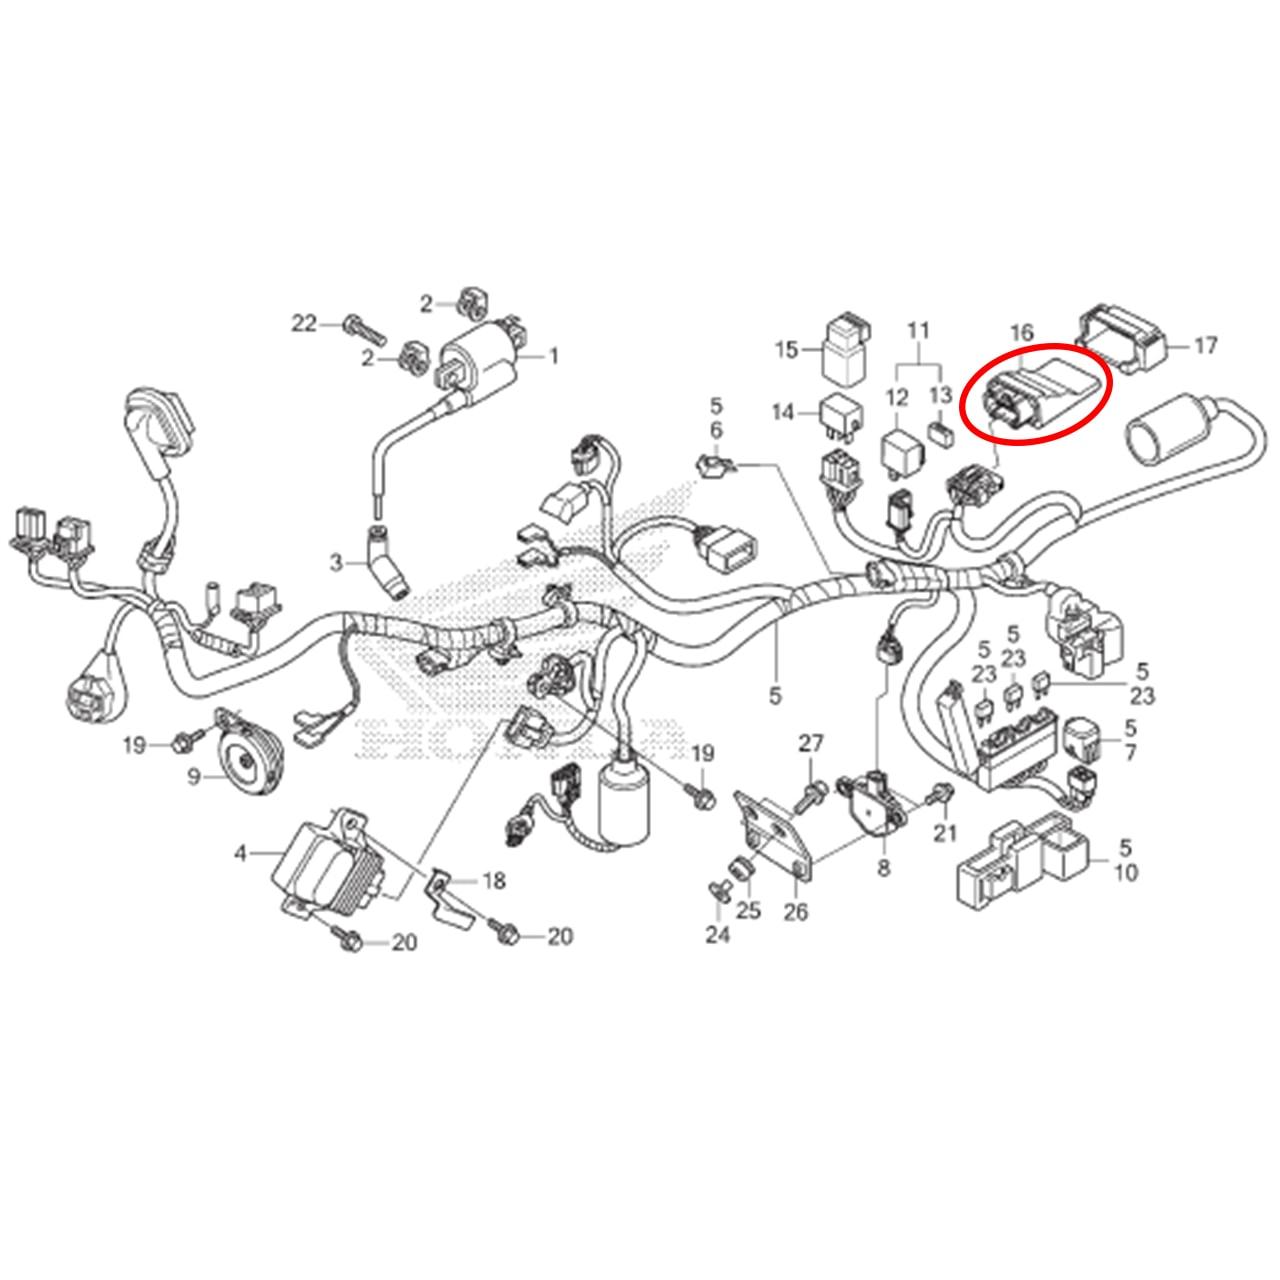 Unidade Modulo PGM Cg 150 TITAN FAN START CARGO 2014 2015 Original Honda 38770KVSF02